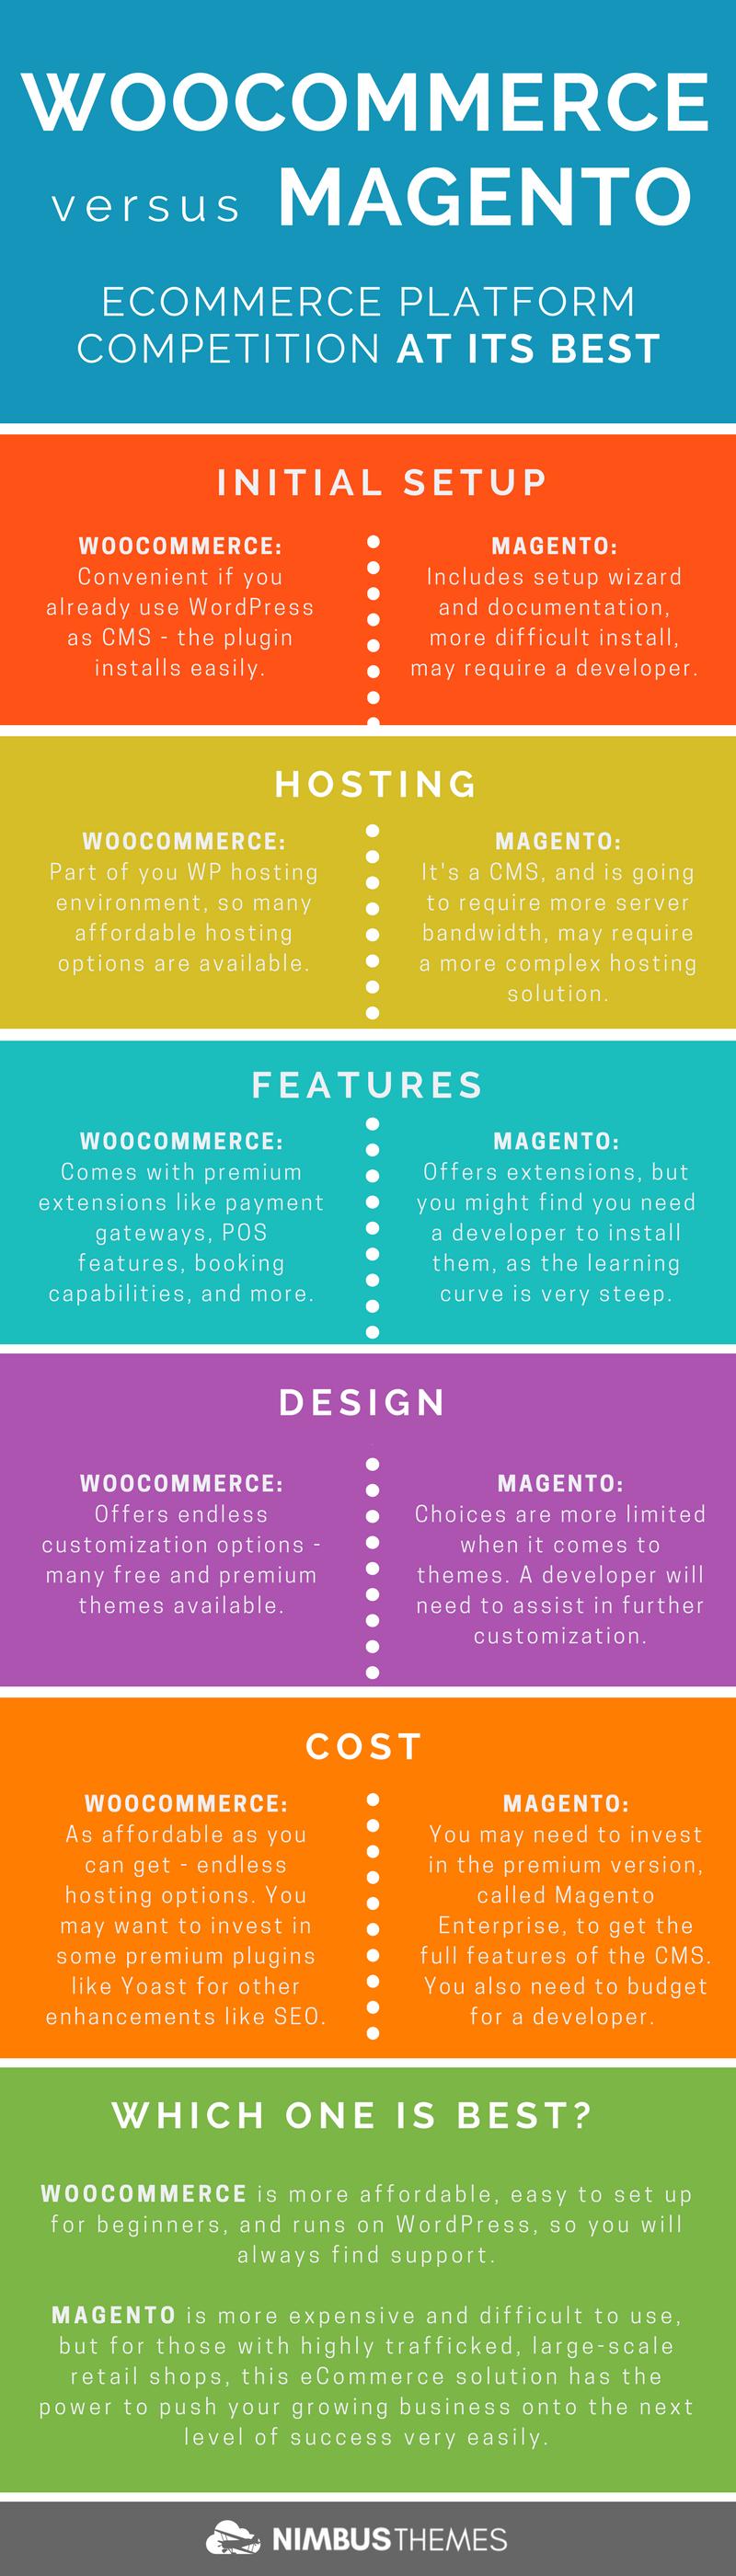 woo-magento-infographic